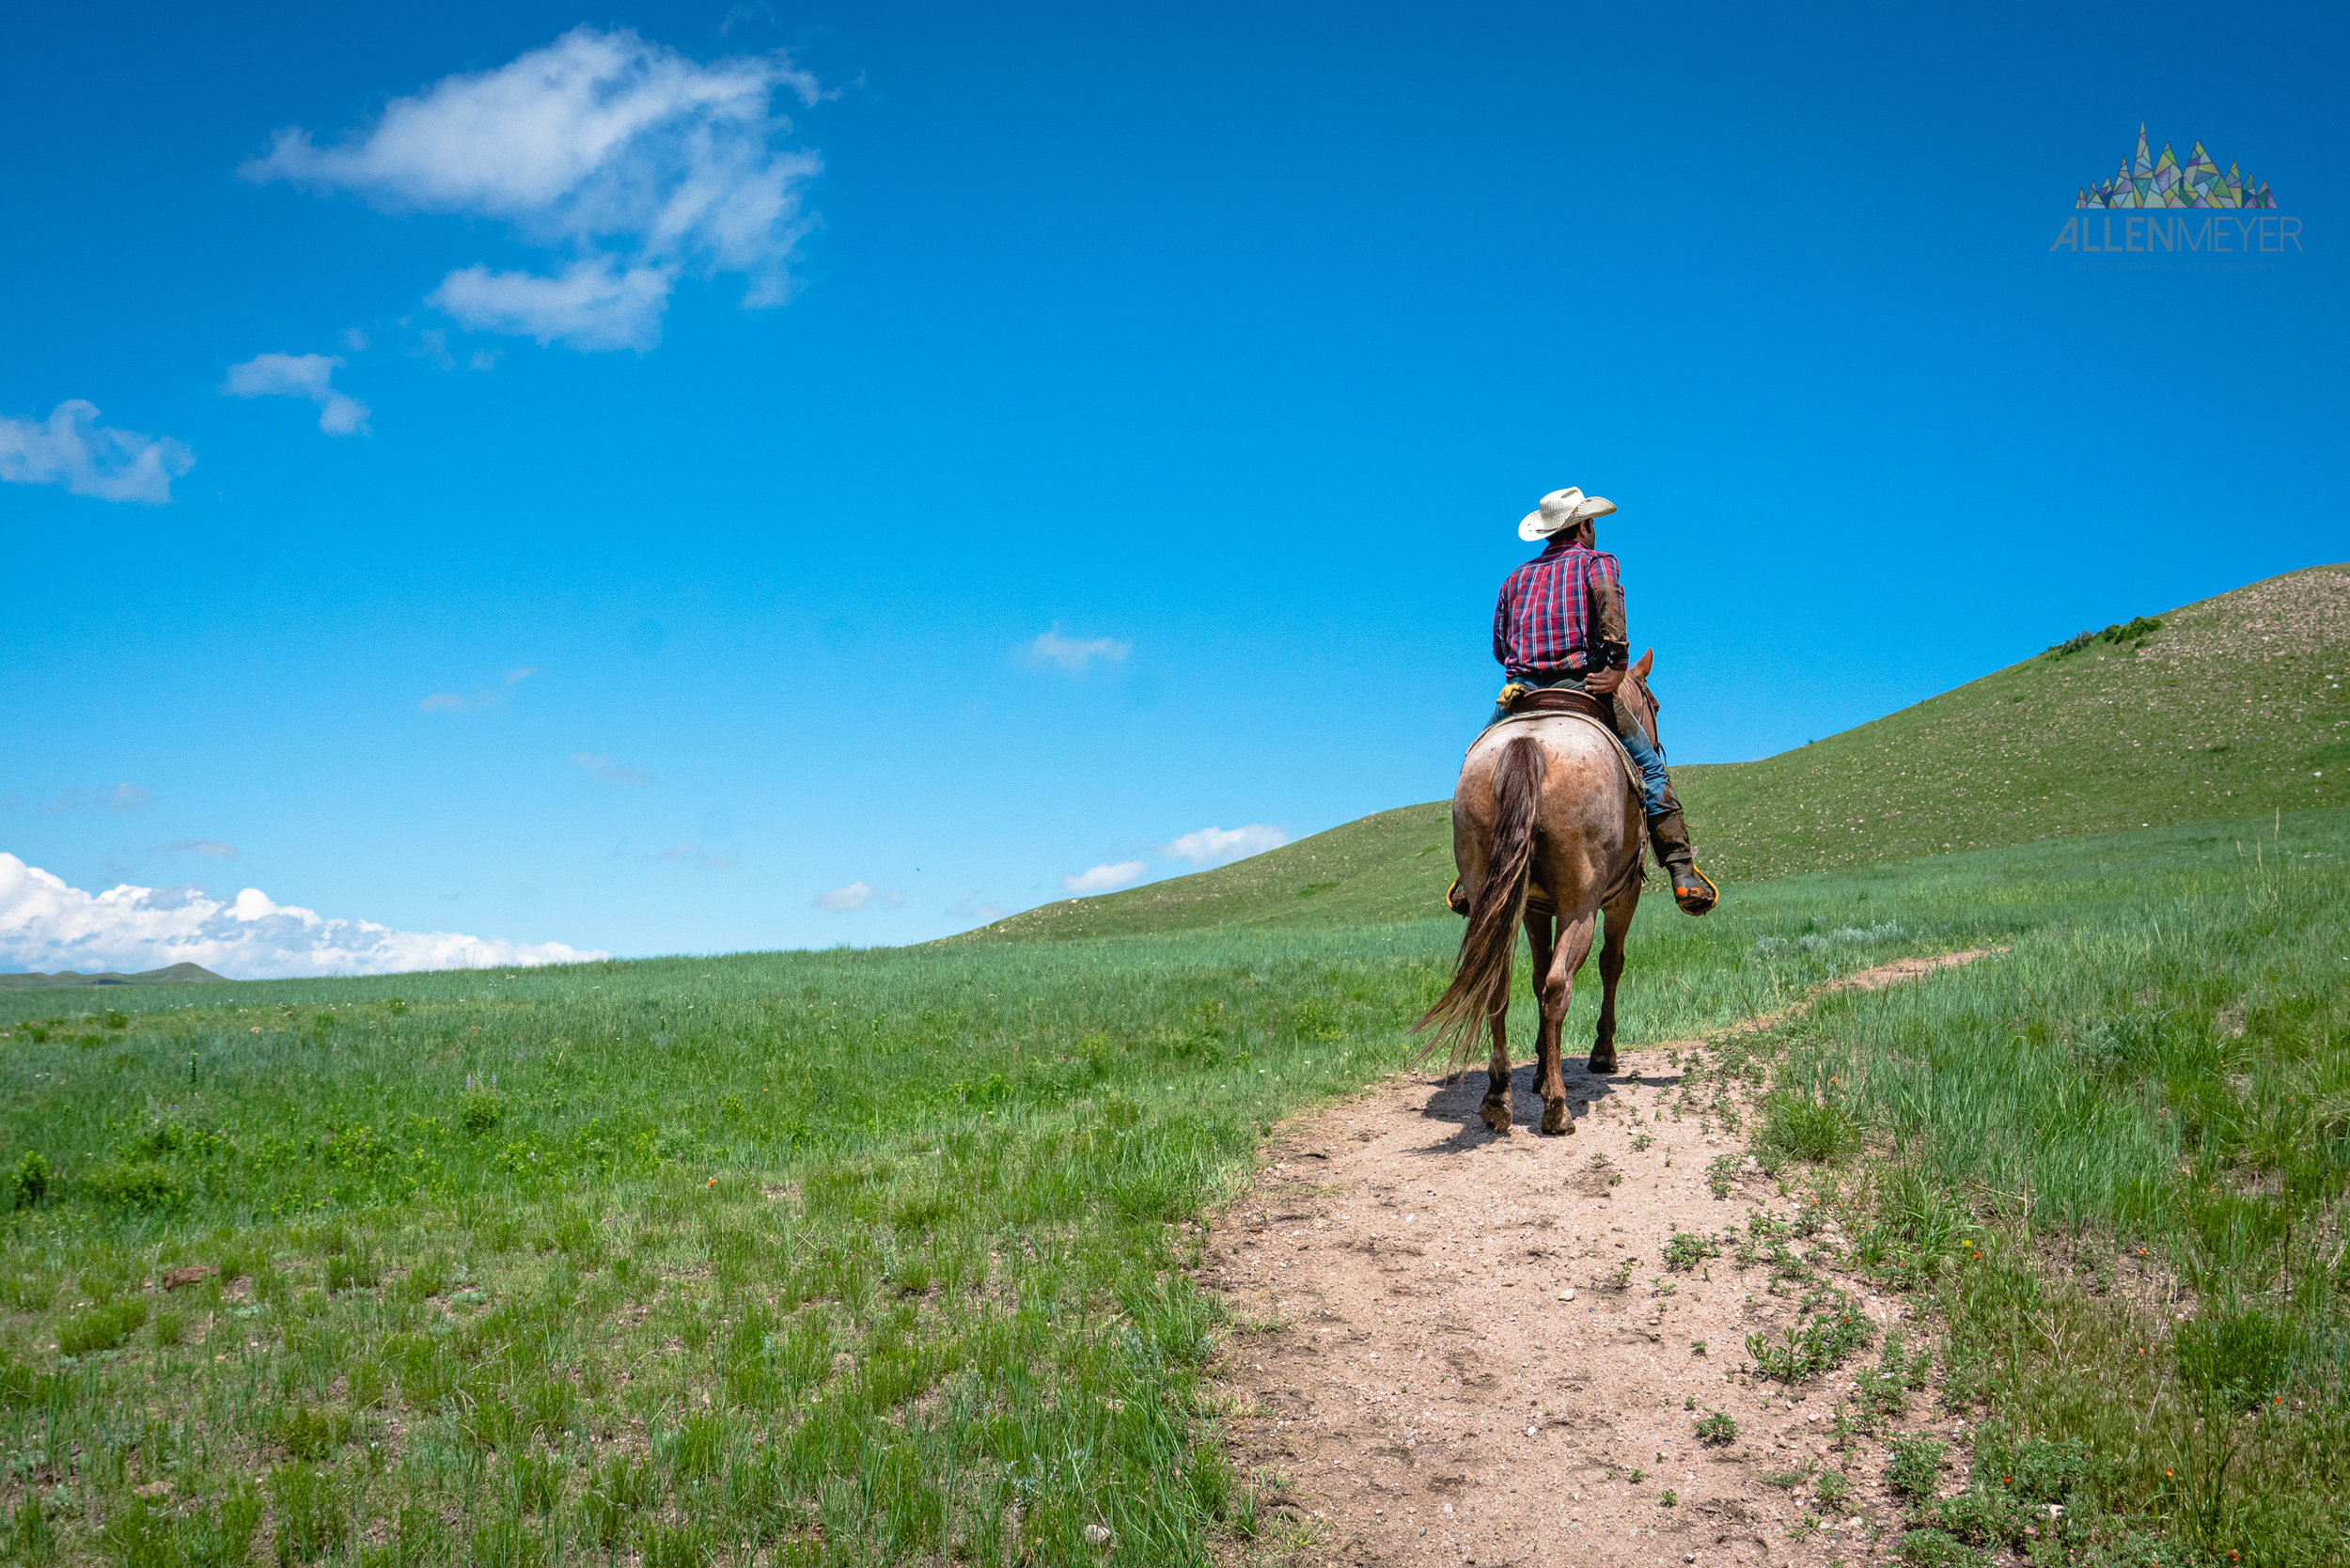 Outdoor Adventures In Cheyenne, Wyoming; Photography by Allen Meyer-04144.jpg